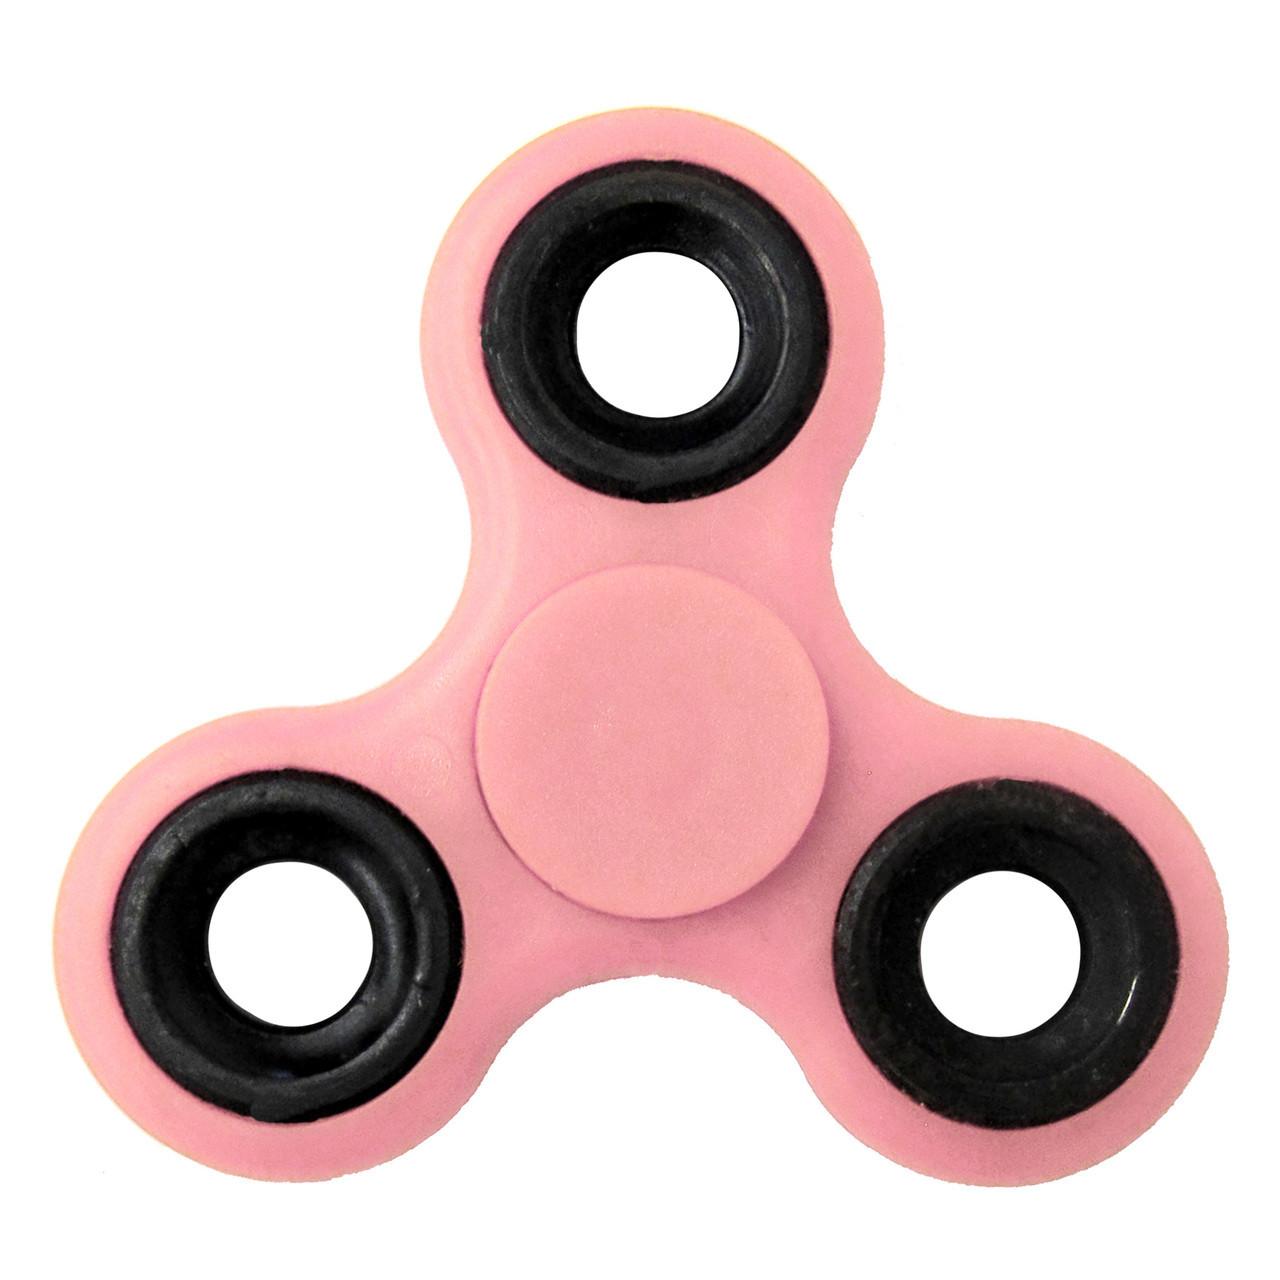 Pink Fidget Spinners!